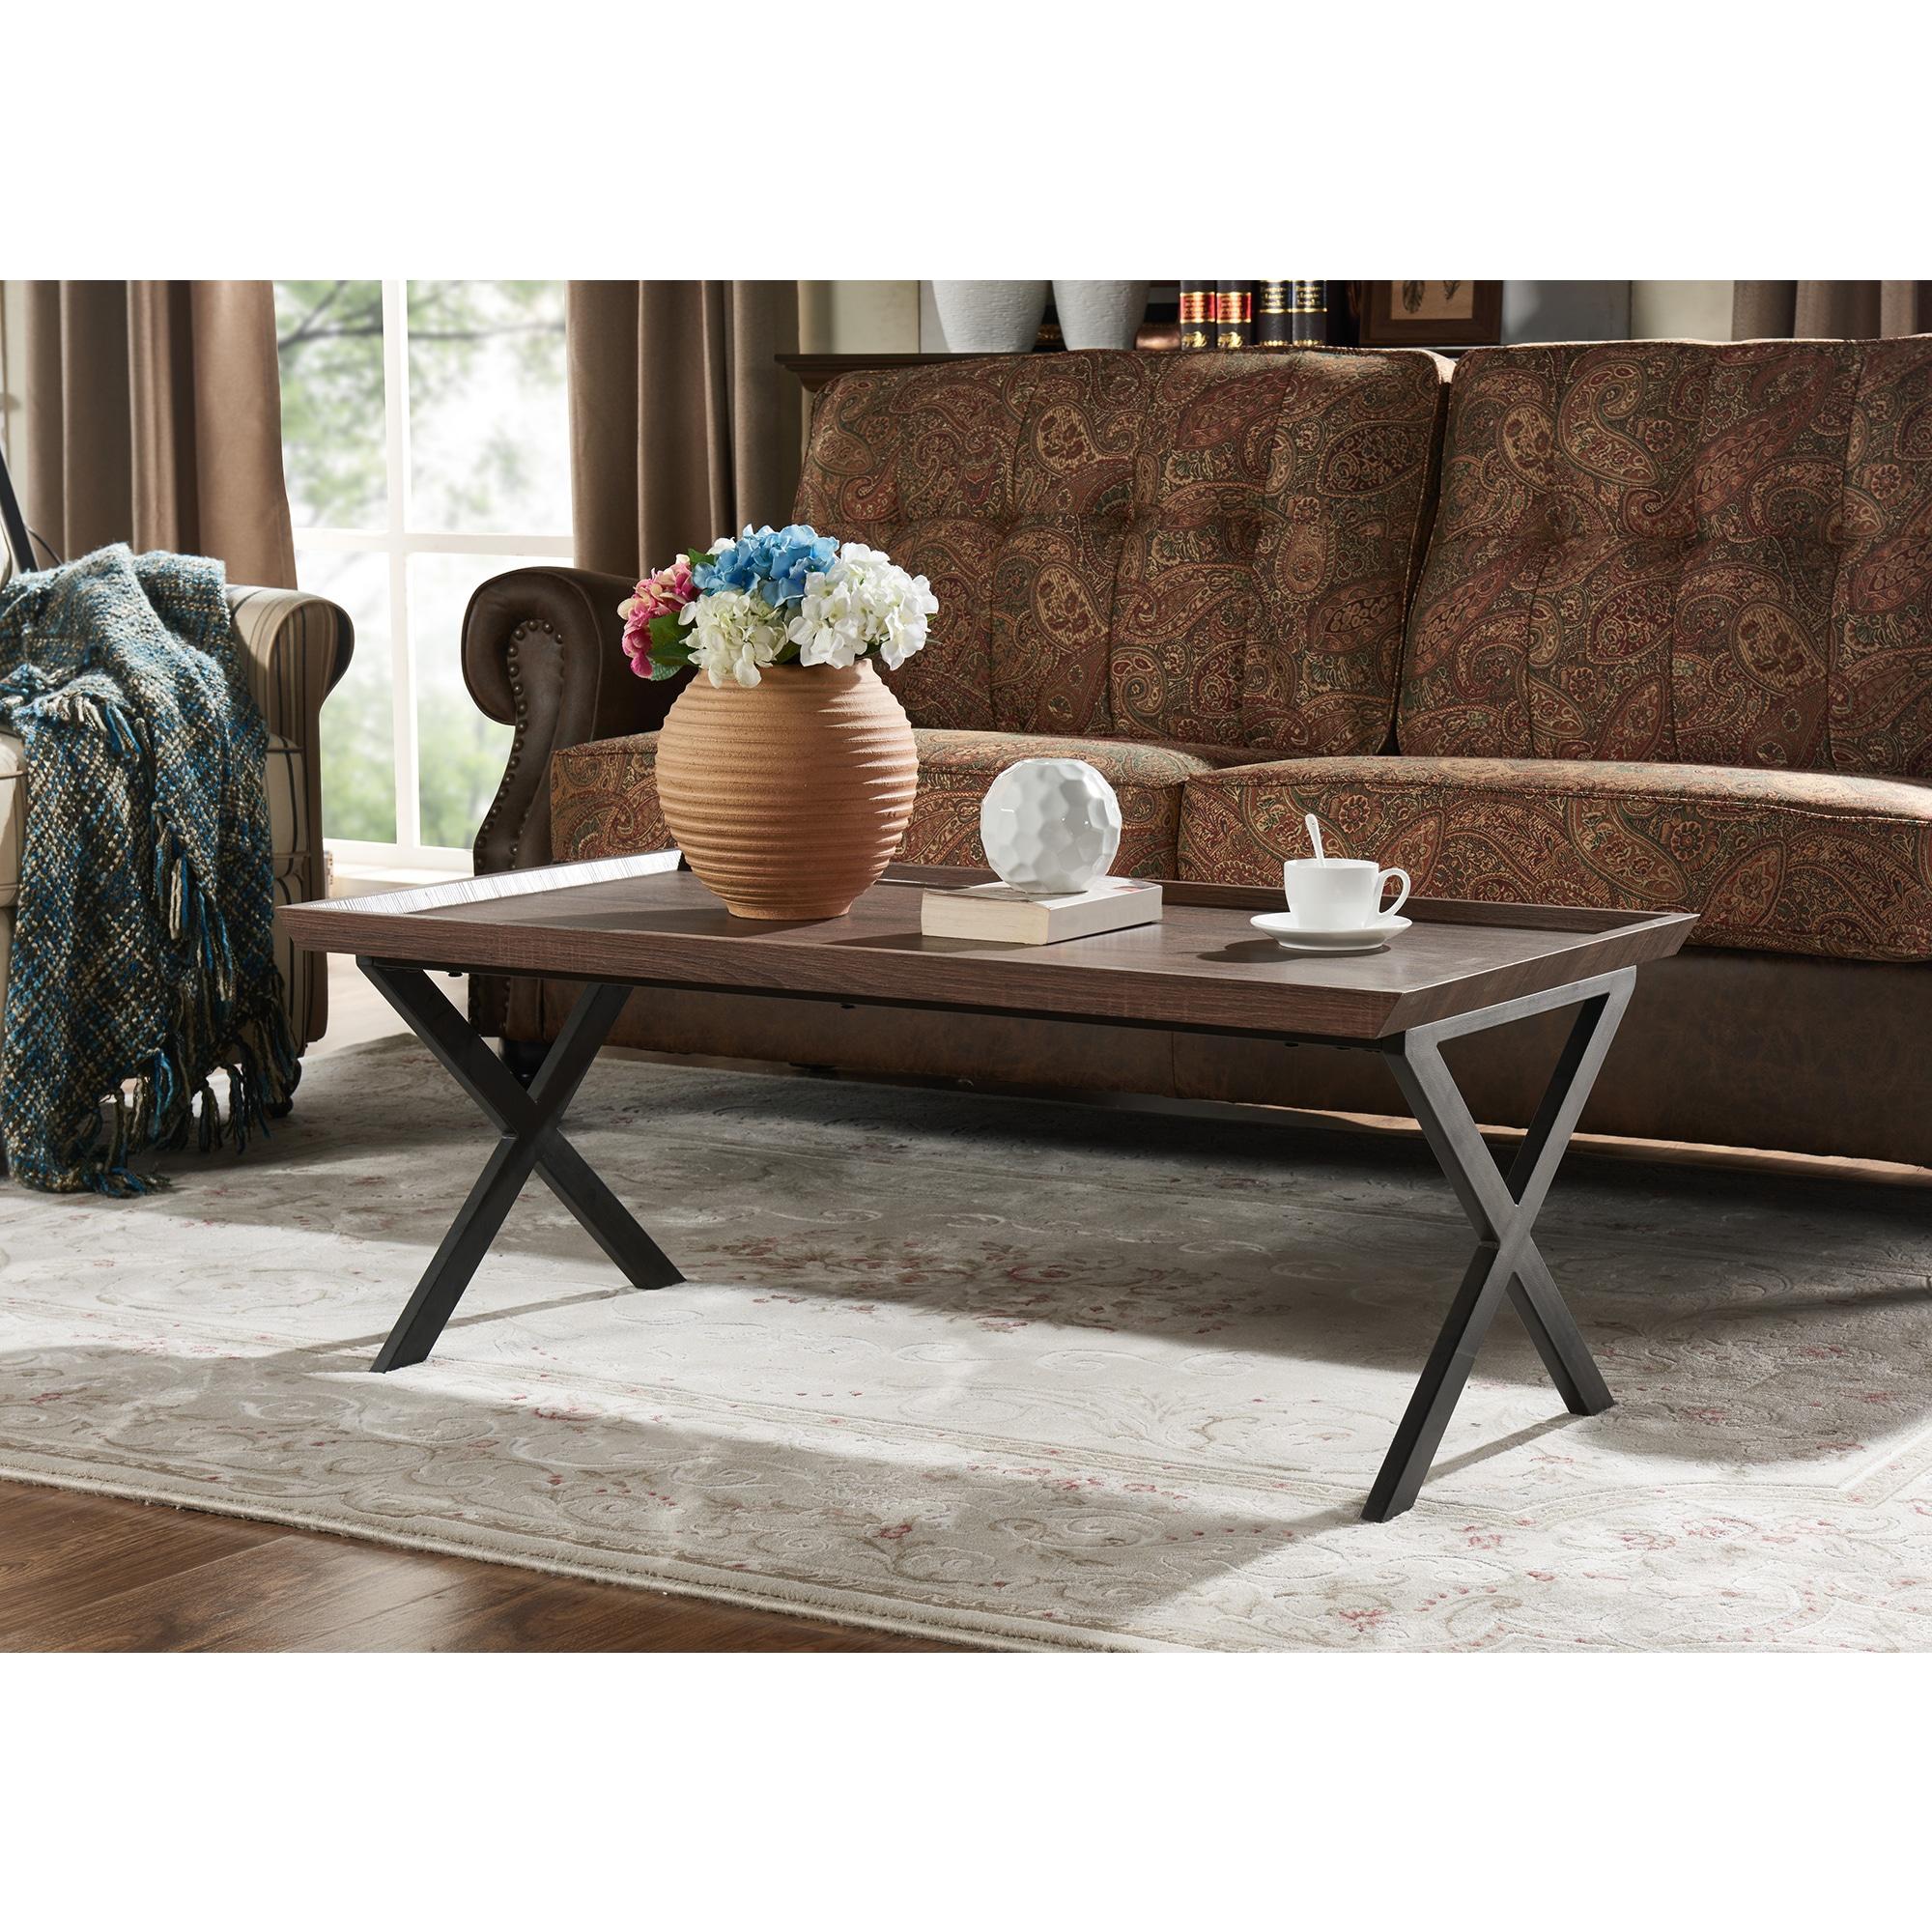 Awesome Handy Living Miller Dark Brown Oak Rectangular Coffee Table With Black Metal Legs Theyellowbook Wood Chair Design Ideas Theyellowbookinfo